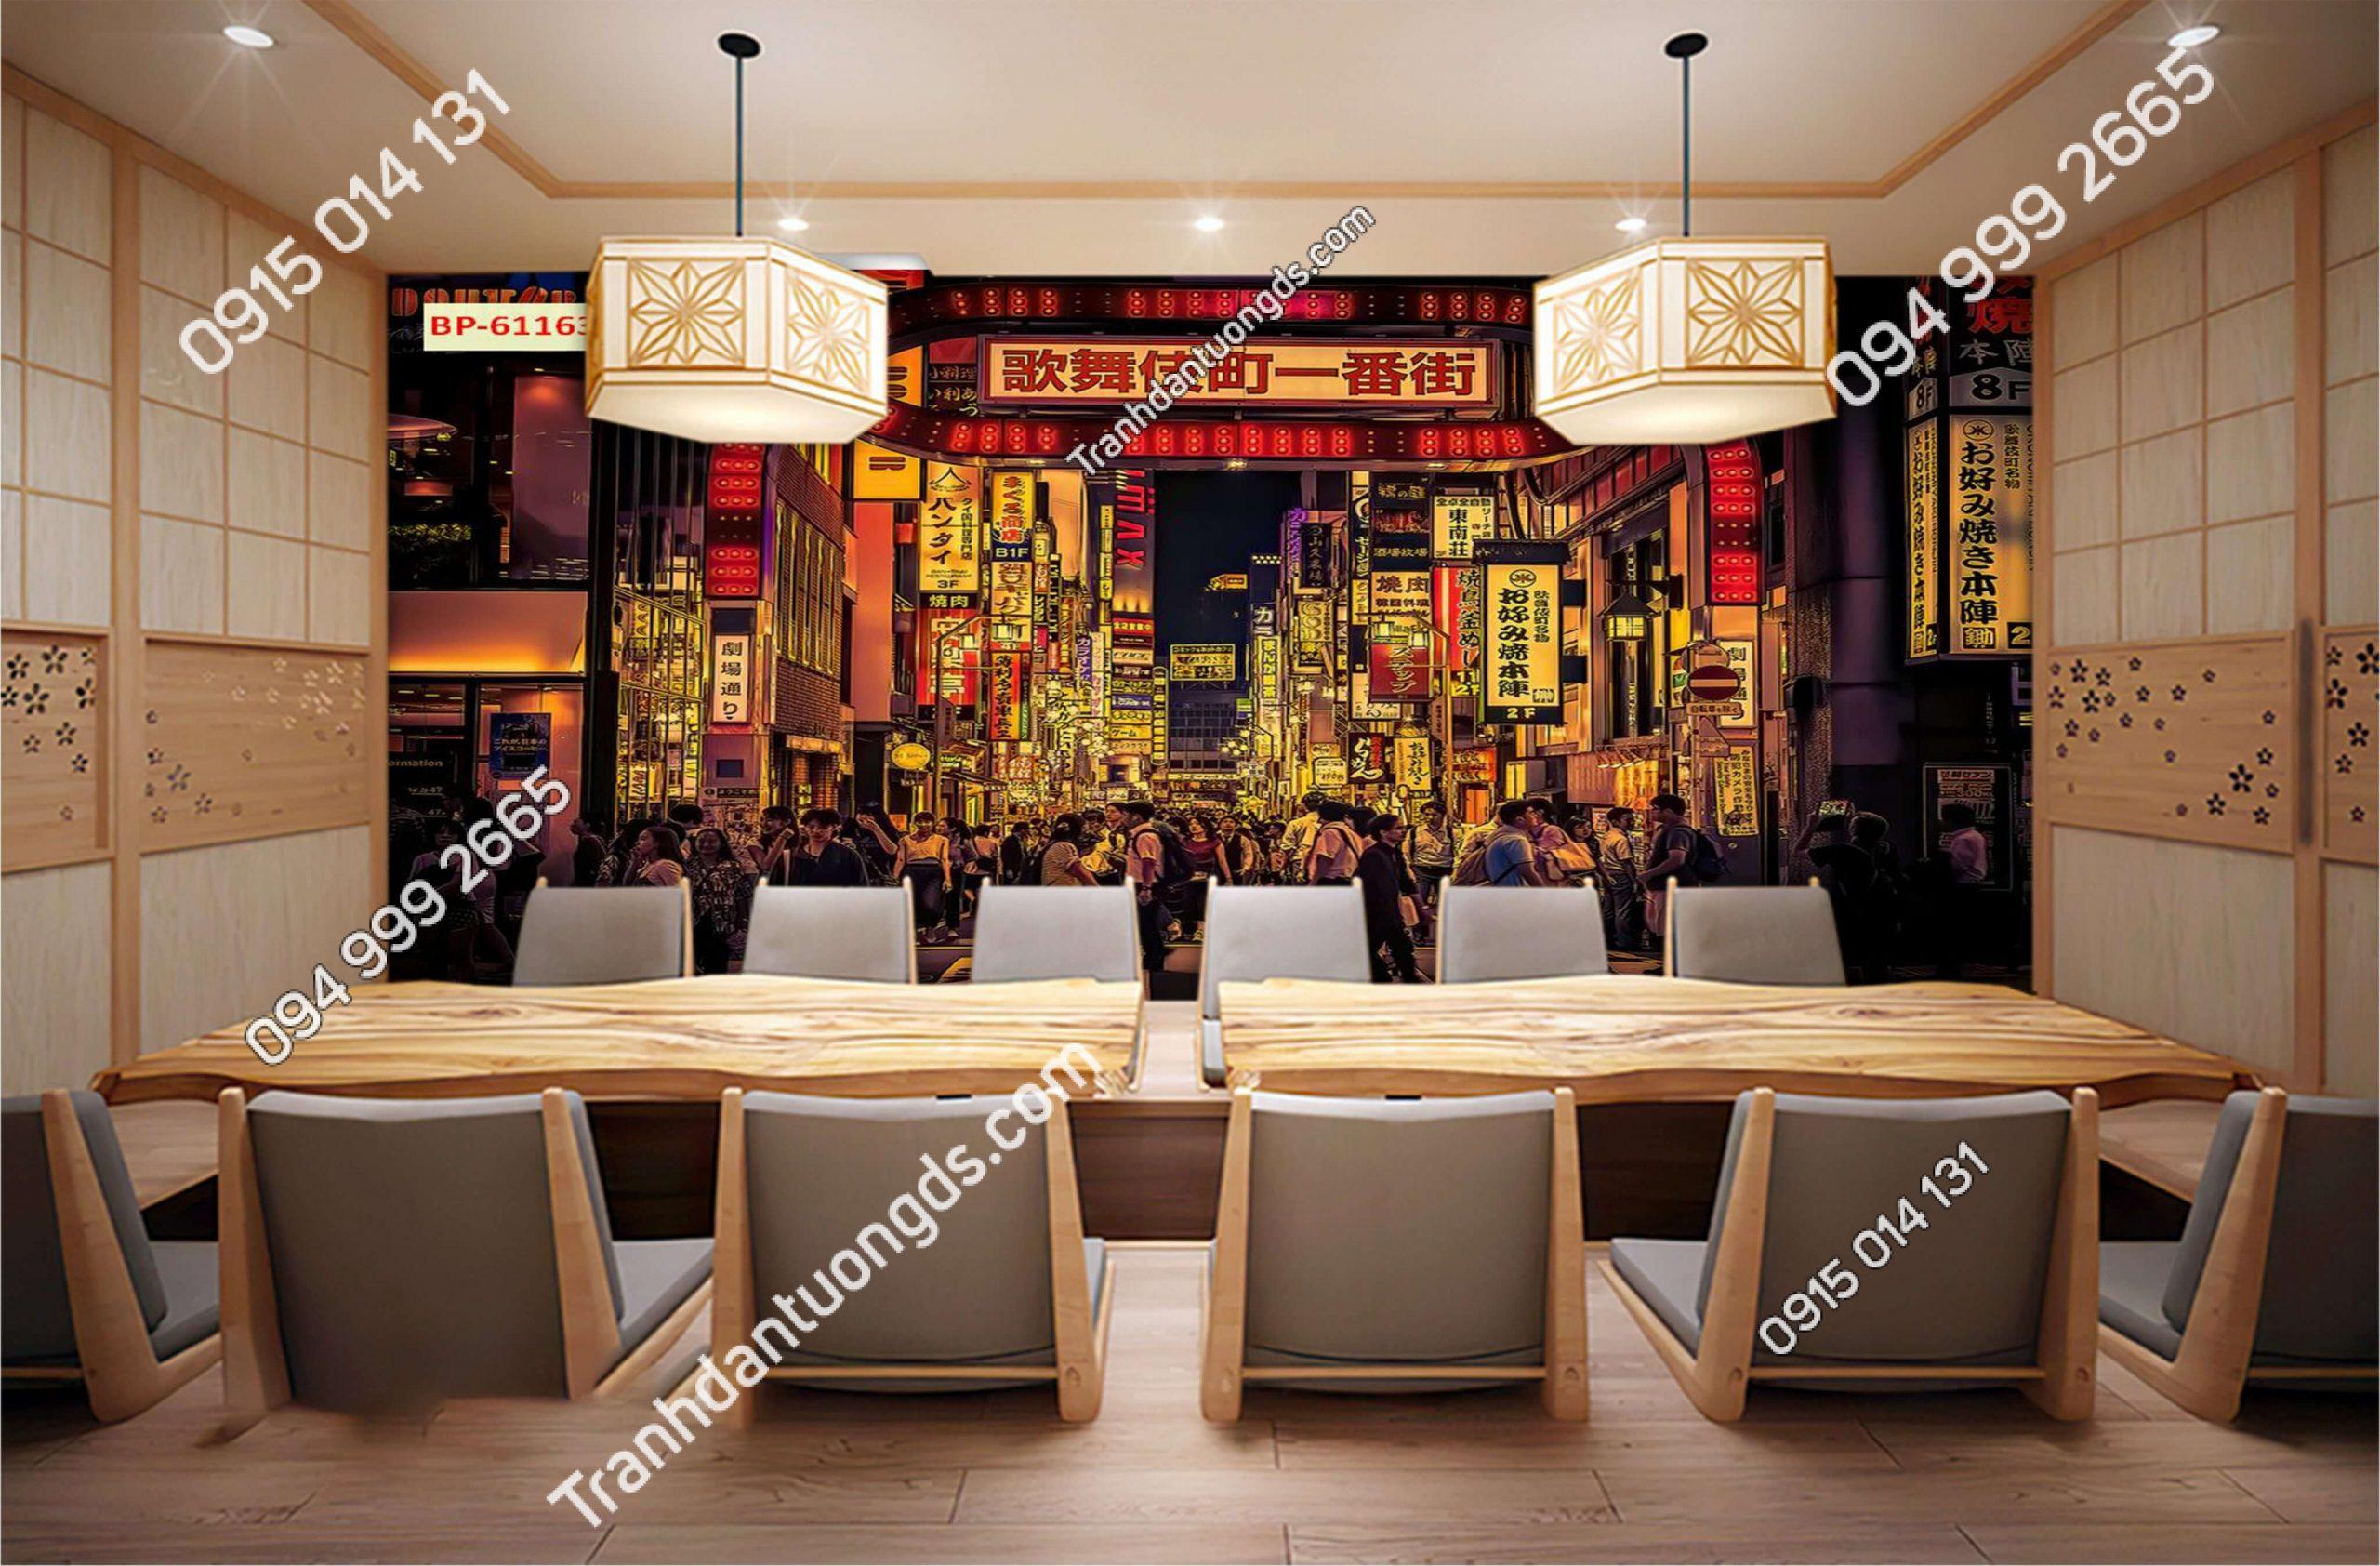 Tranh 3D hongkong quán cafe